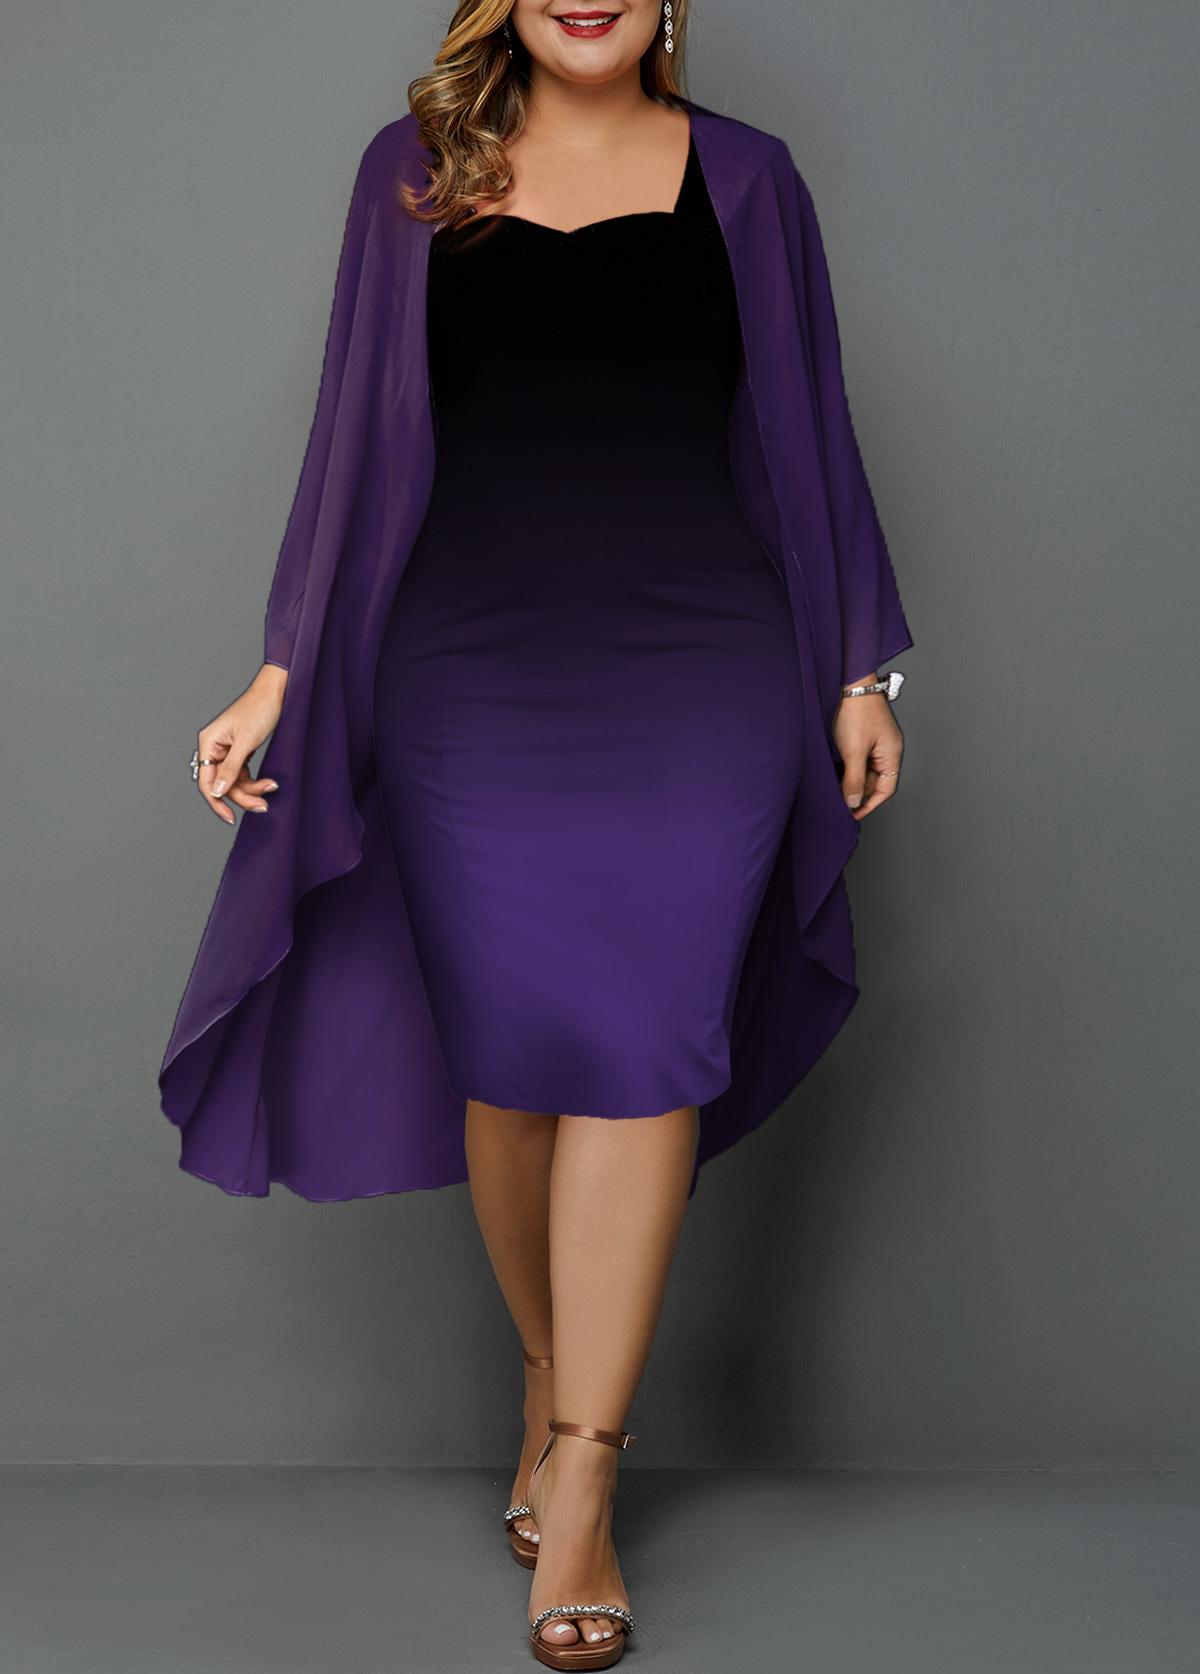 Plus Size Chiffon Cardigan and Gradient Dress